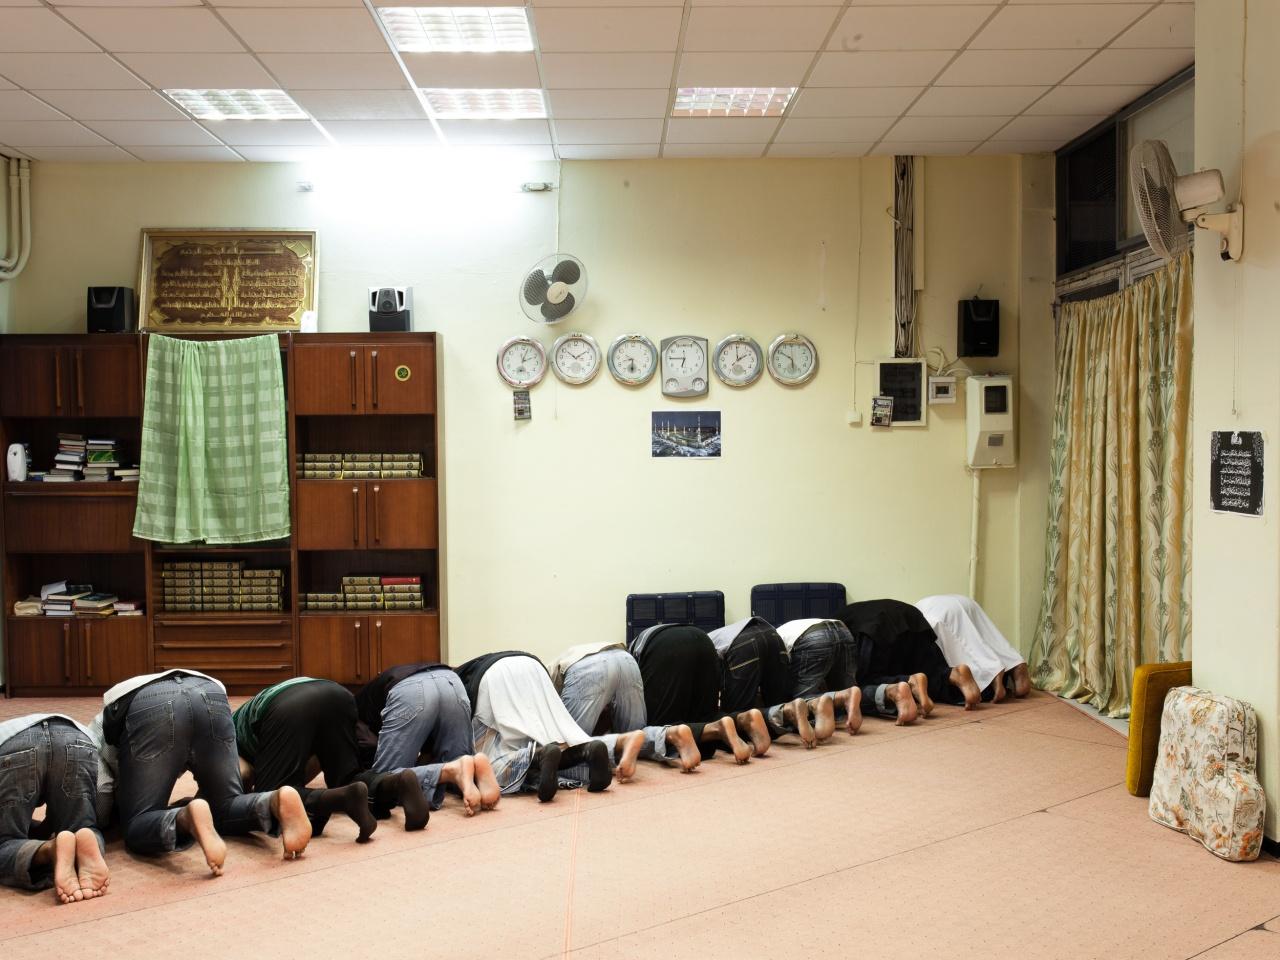 Informal_mosques_wpo-4.jpg